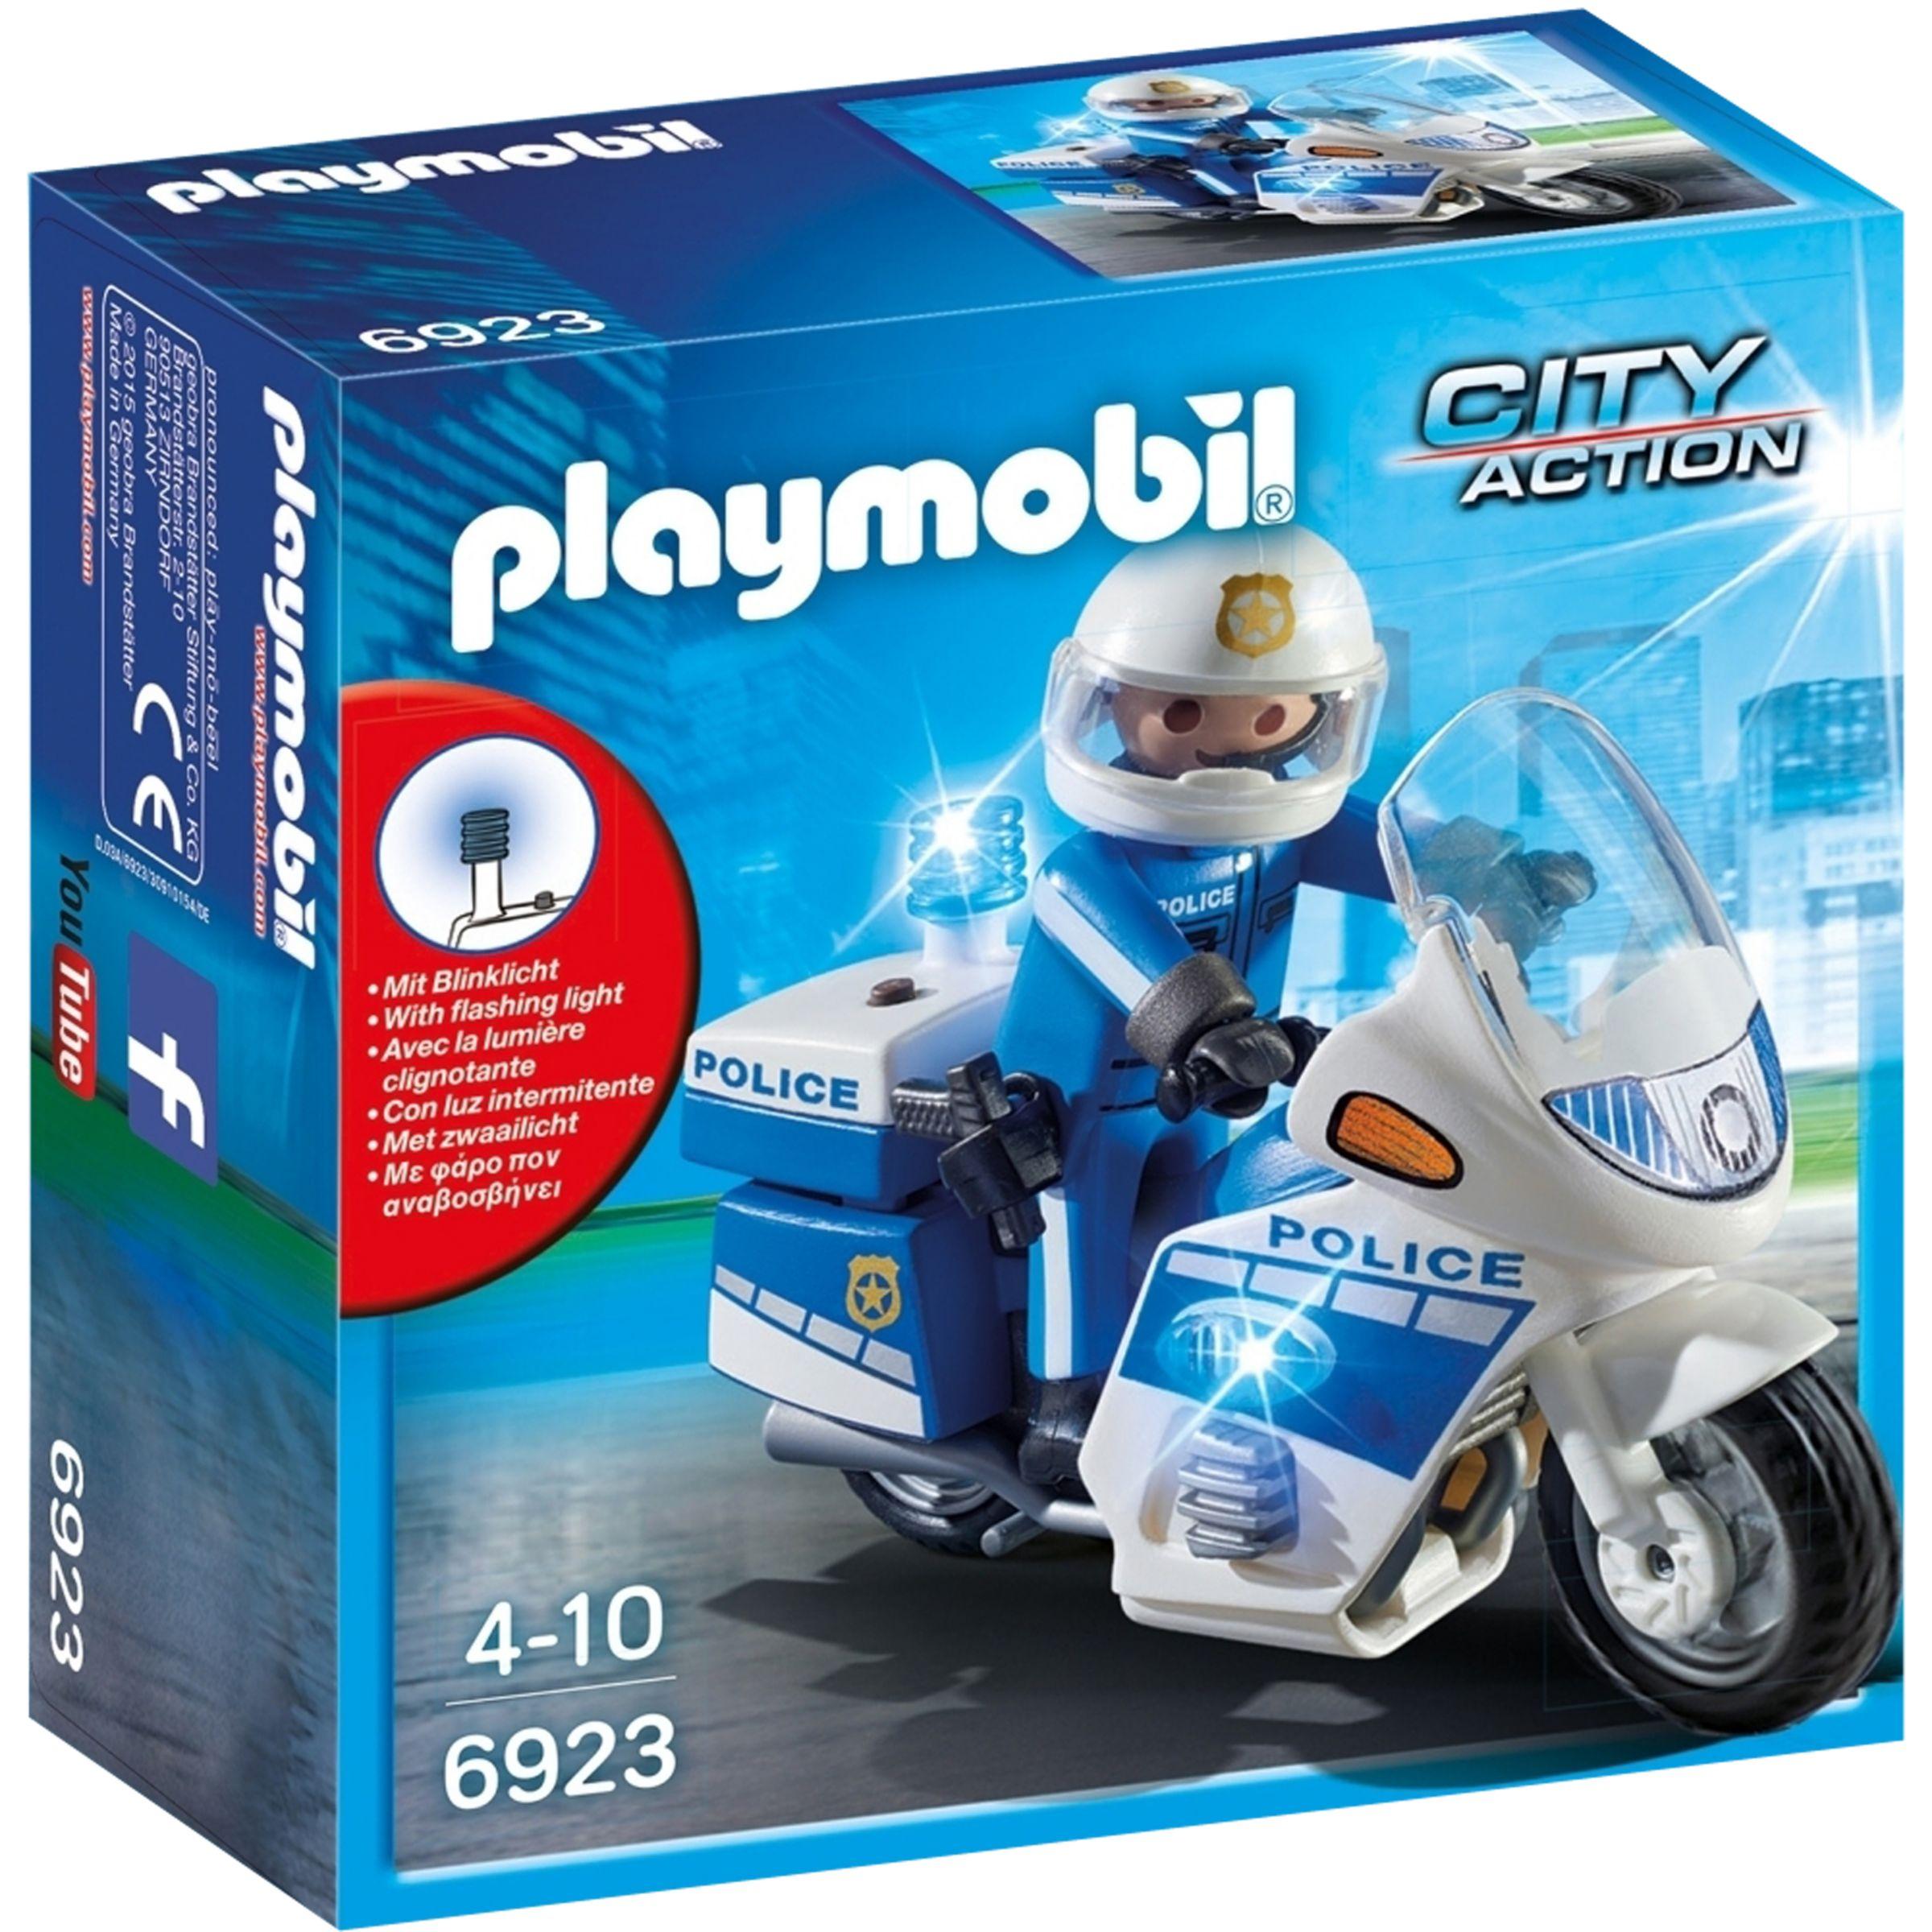 PLAYMOBIL Playmobil Police Motorbike with LED Light